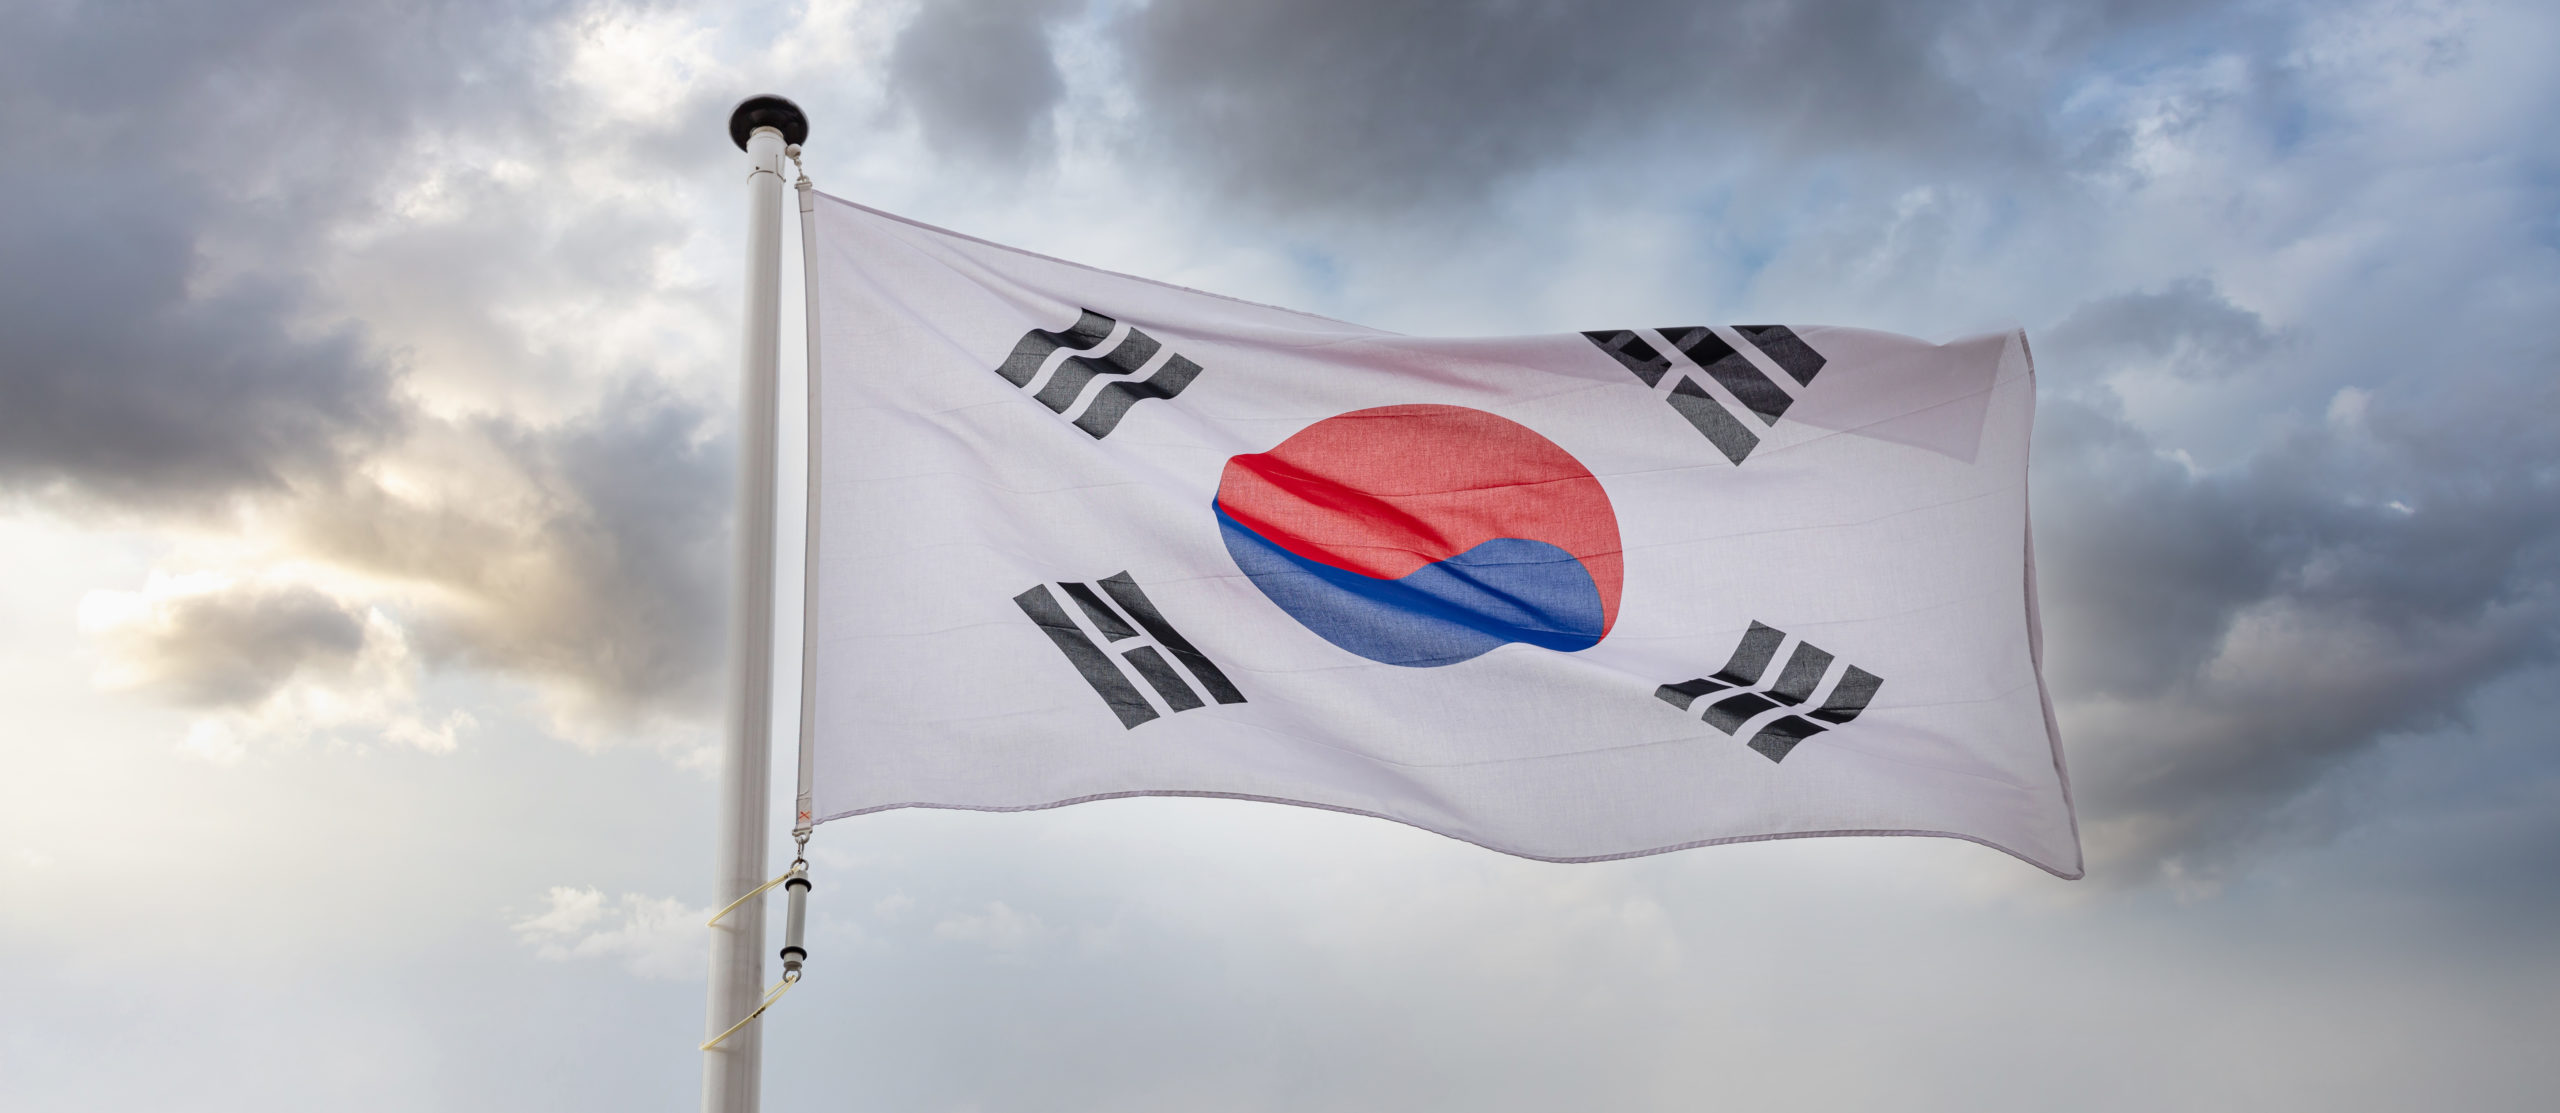 south korea flag waving against cloudy sky DVGMXHR scaled